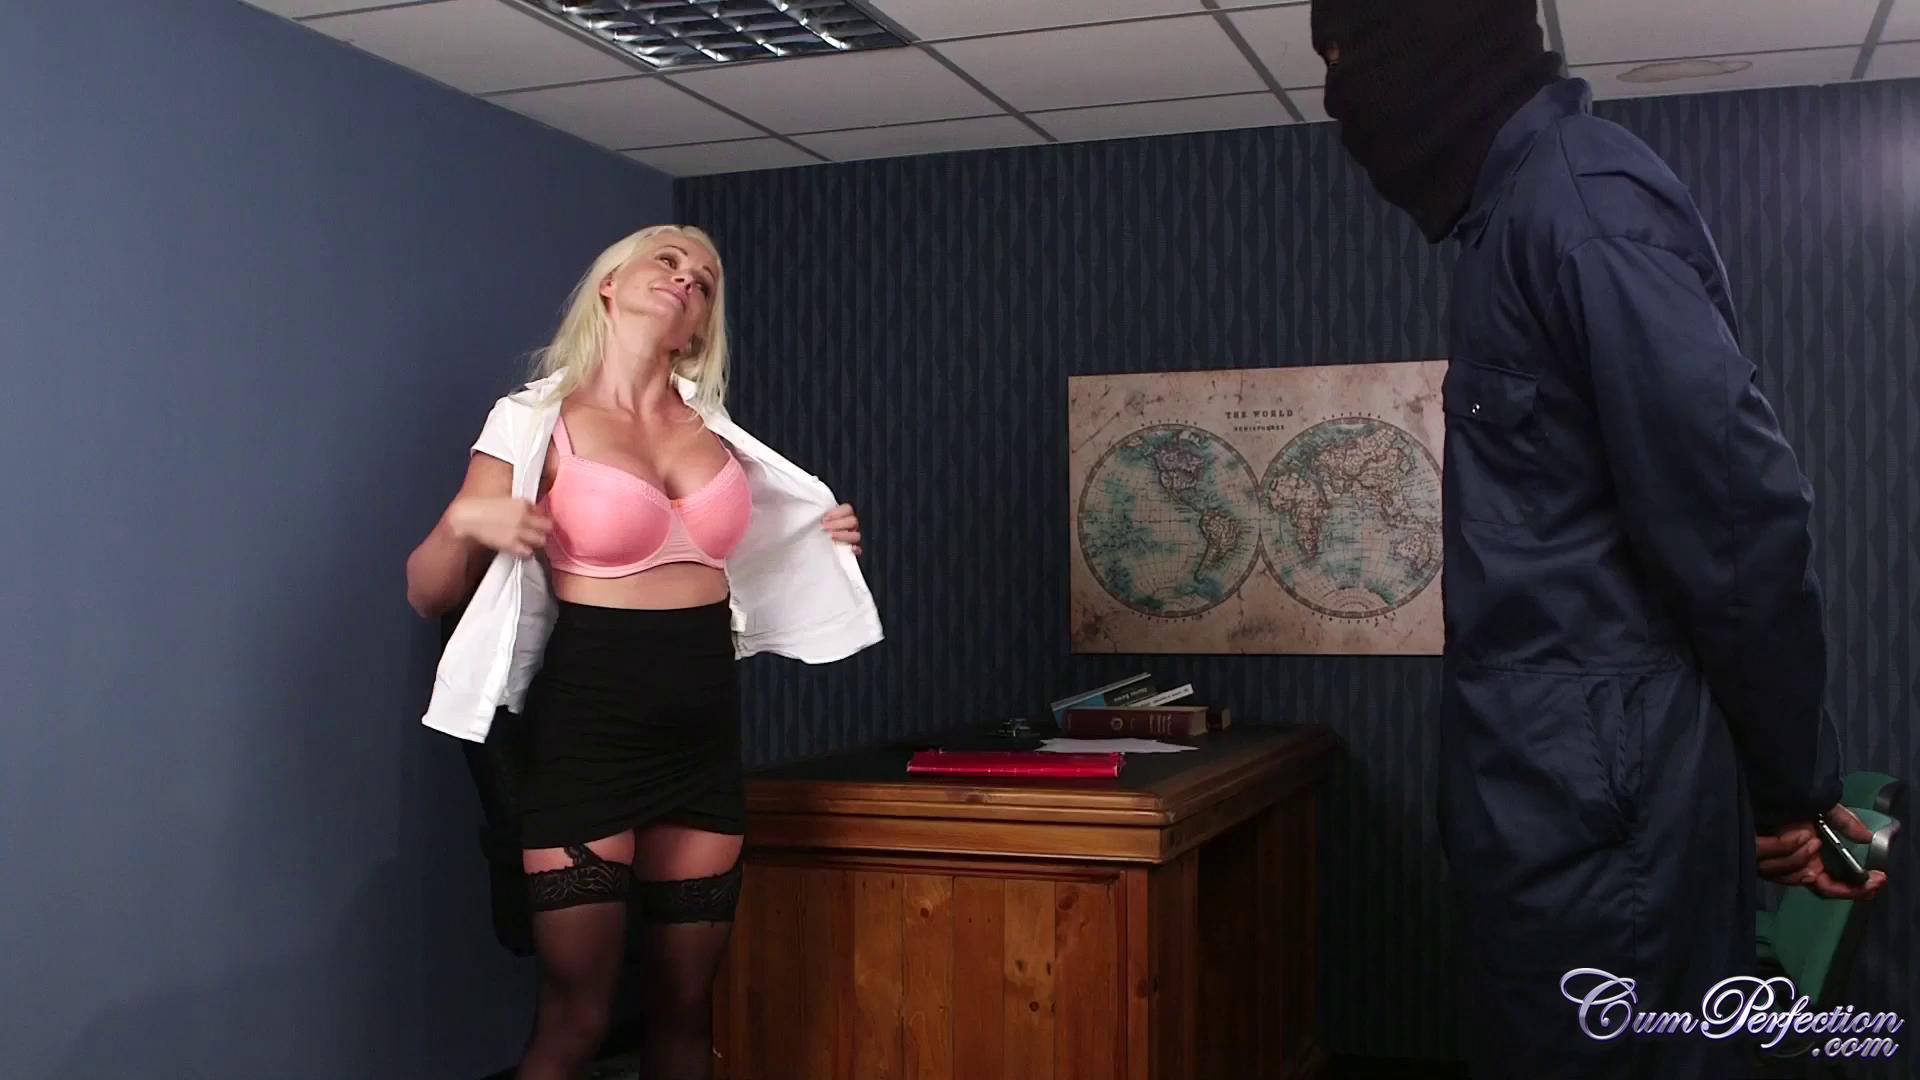 CumPerfection – Cindy Sun Burglar Blow Job